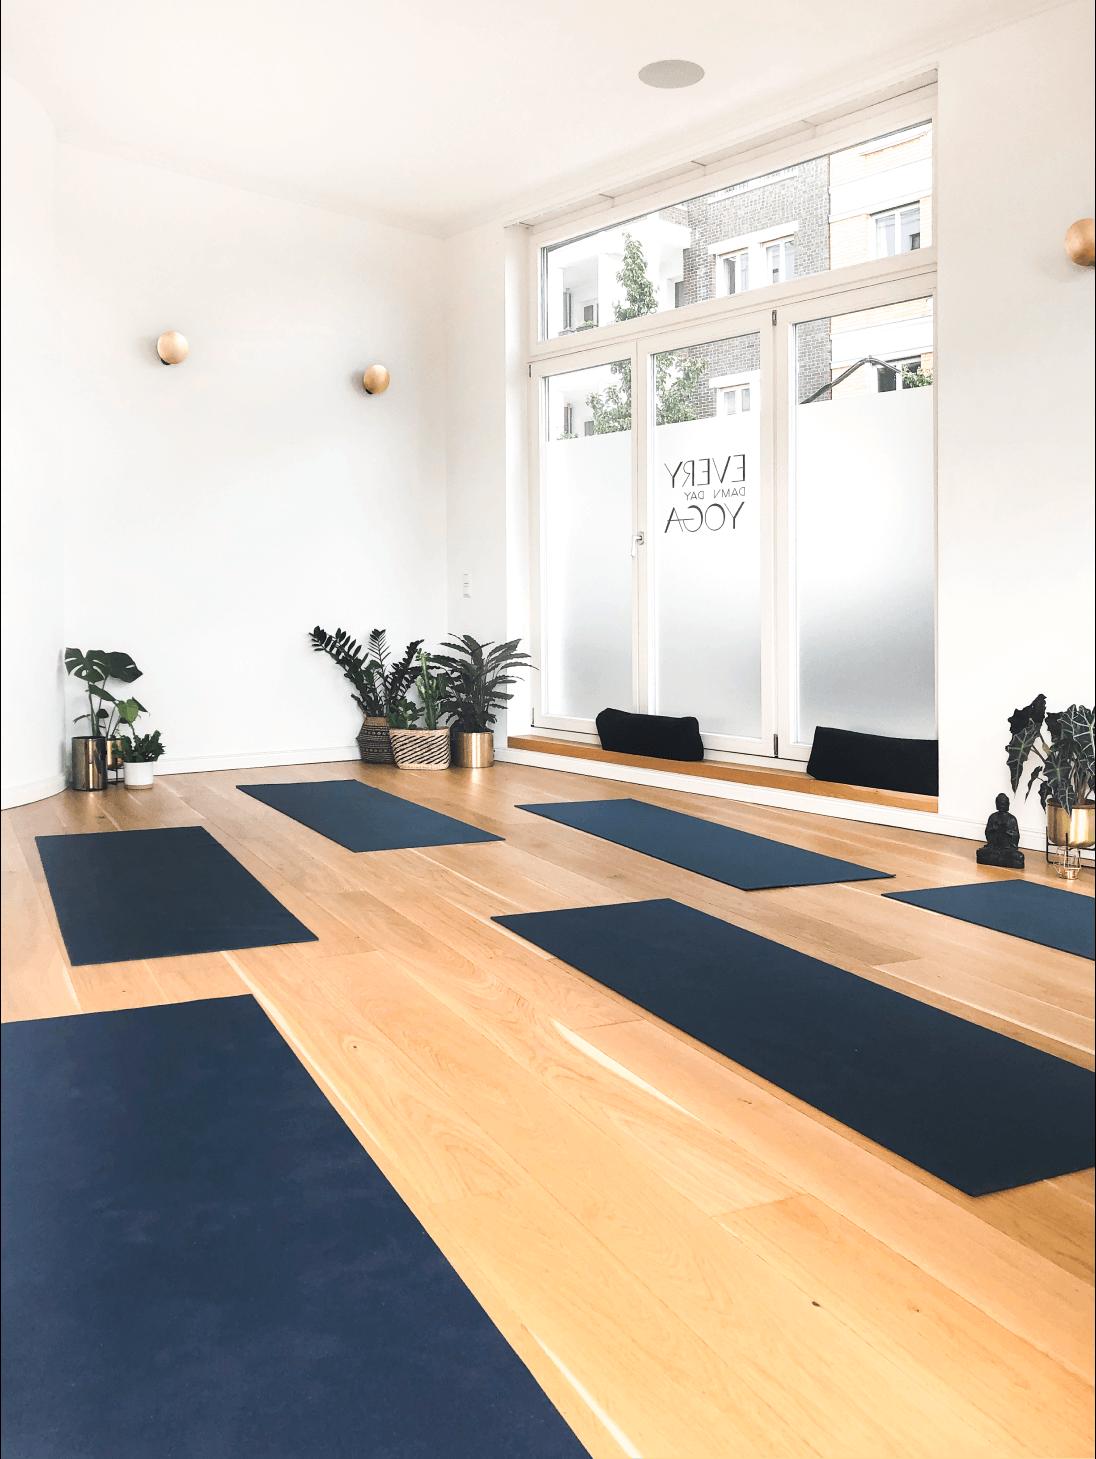 Every Damn Day Yoga Studio Berlin Friedrichshain